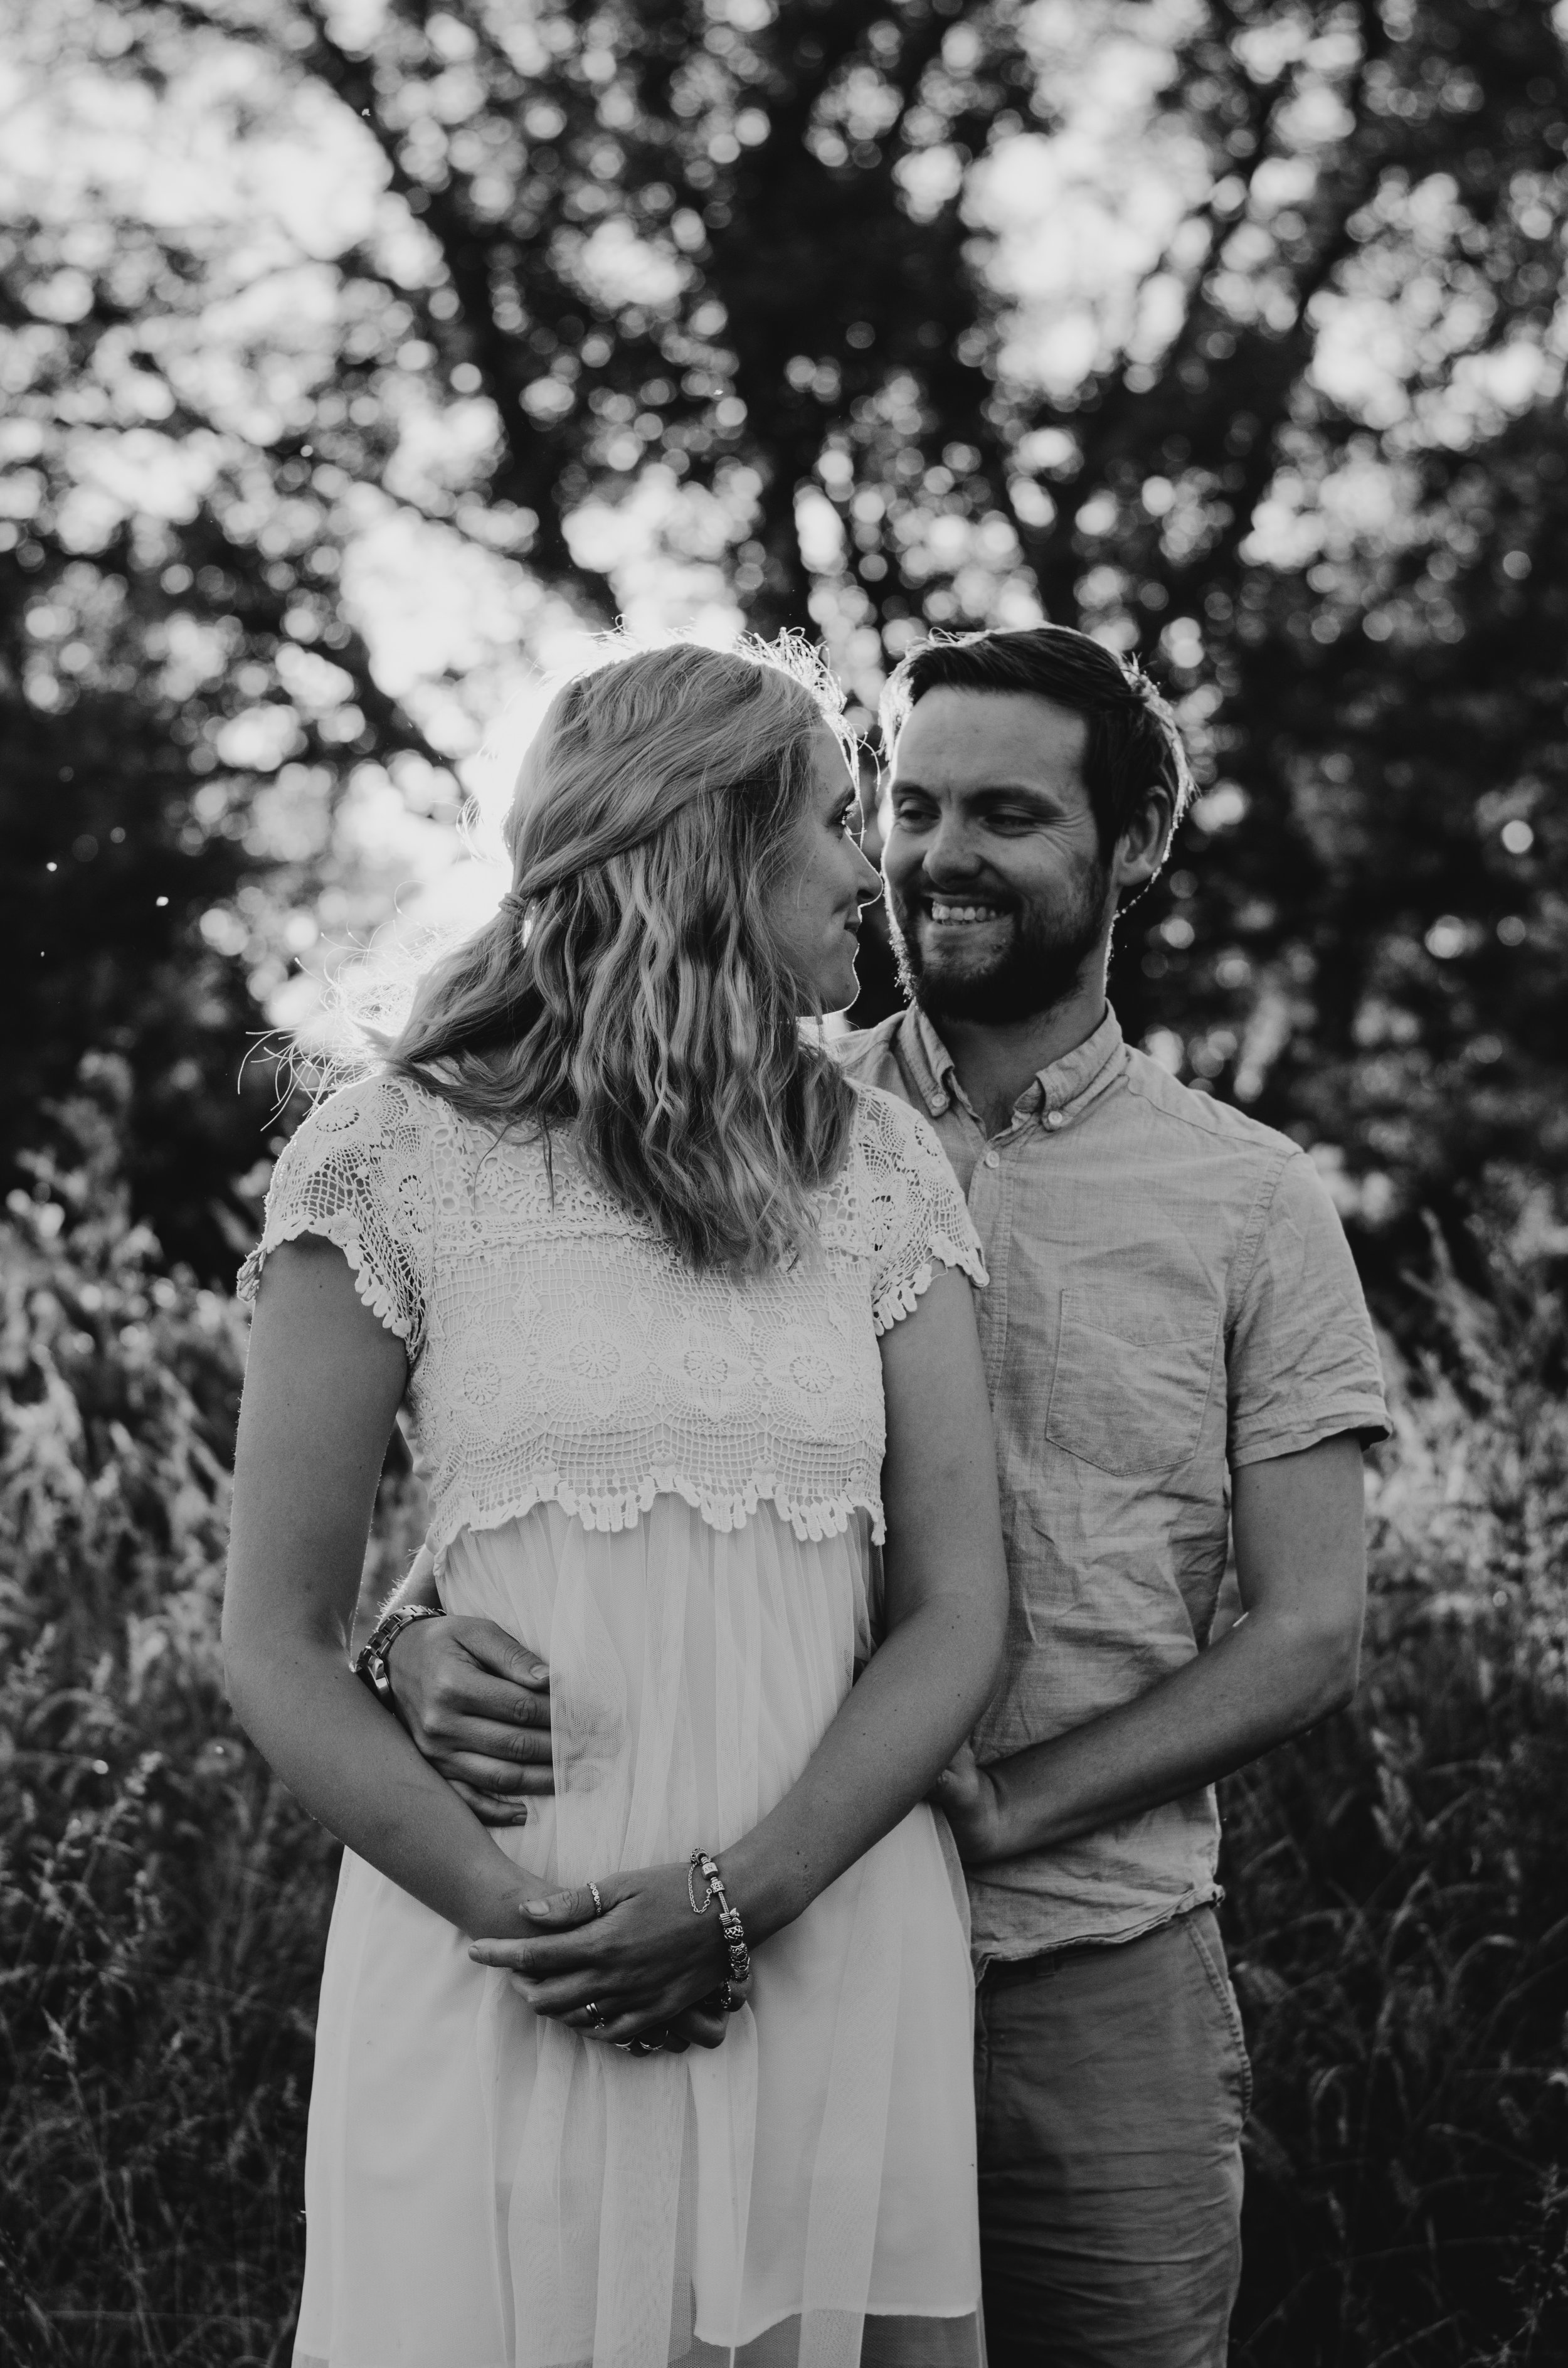 Gina & Chris - Barcombe Mills - Couple Session - Aiste Saulyte Photography-81.jpg